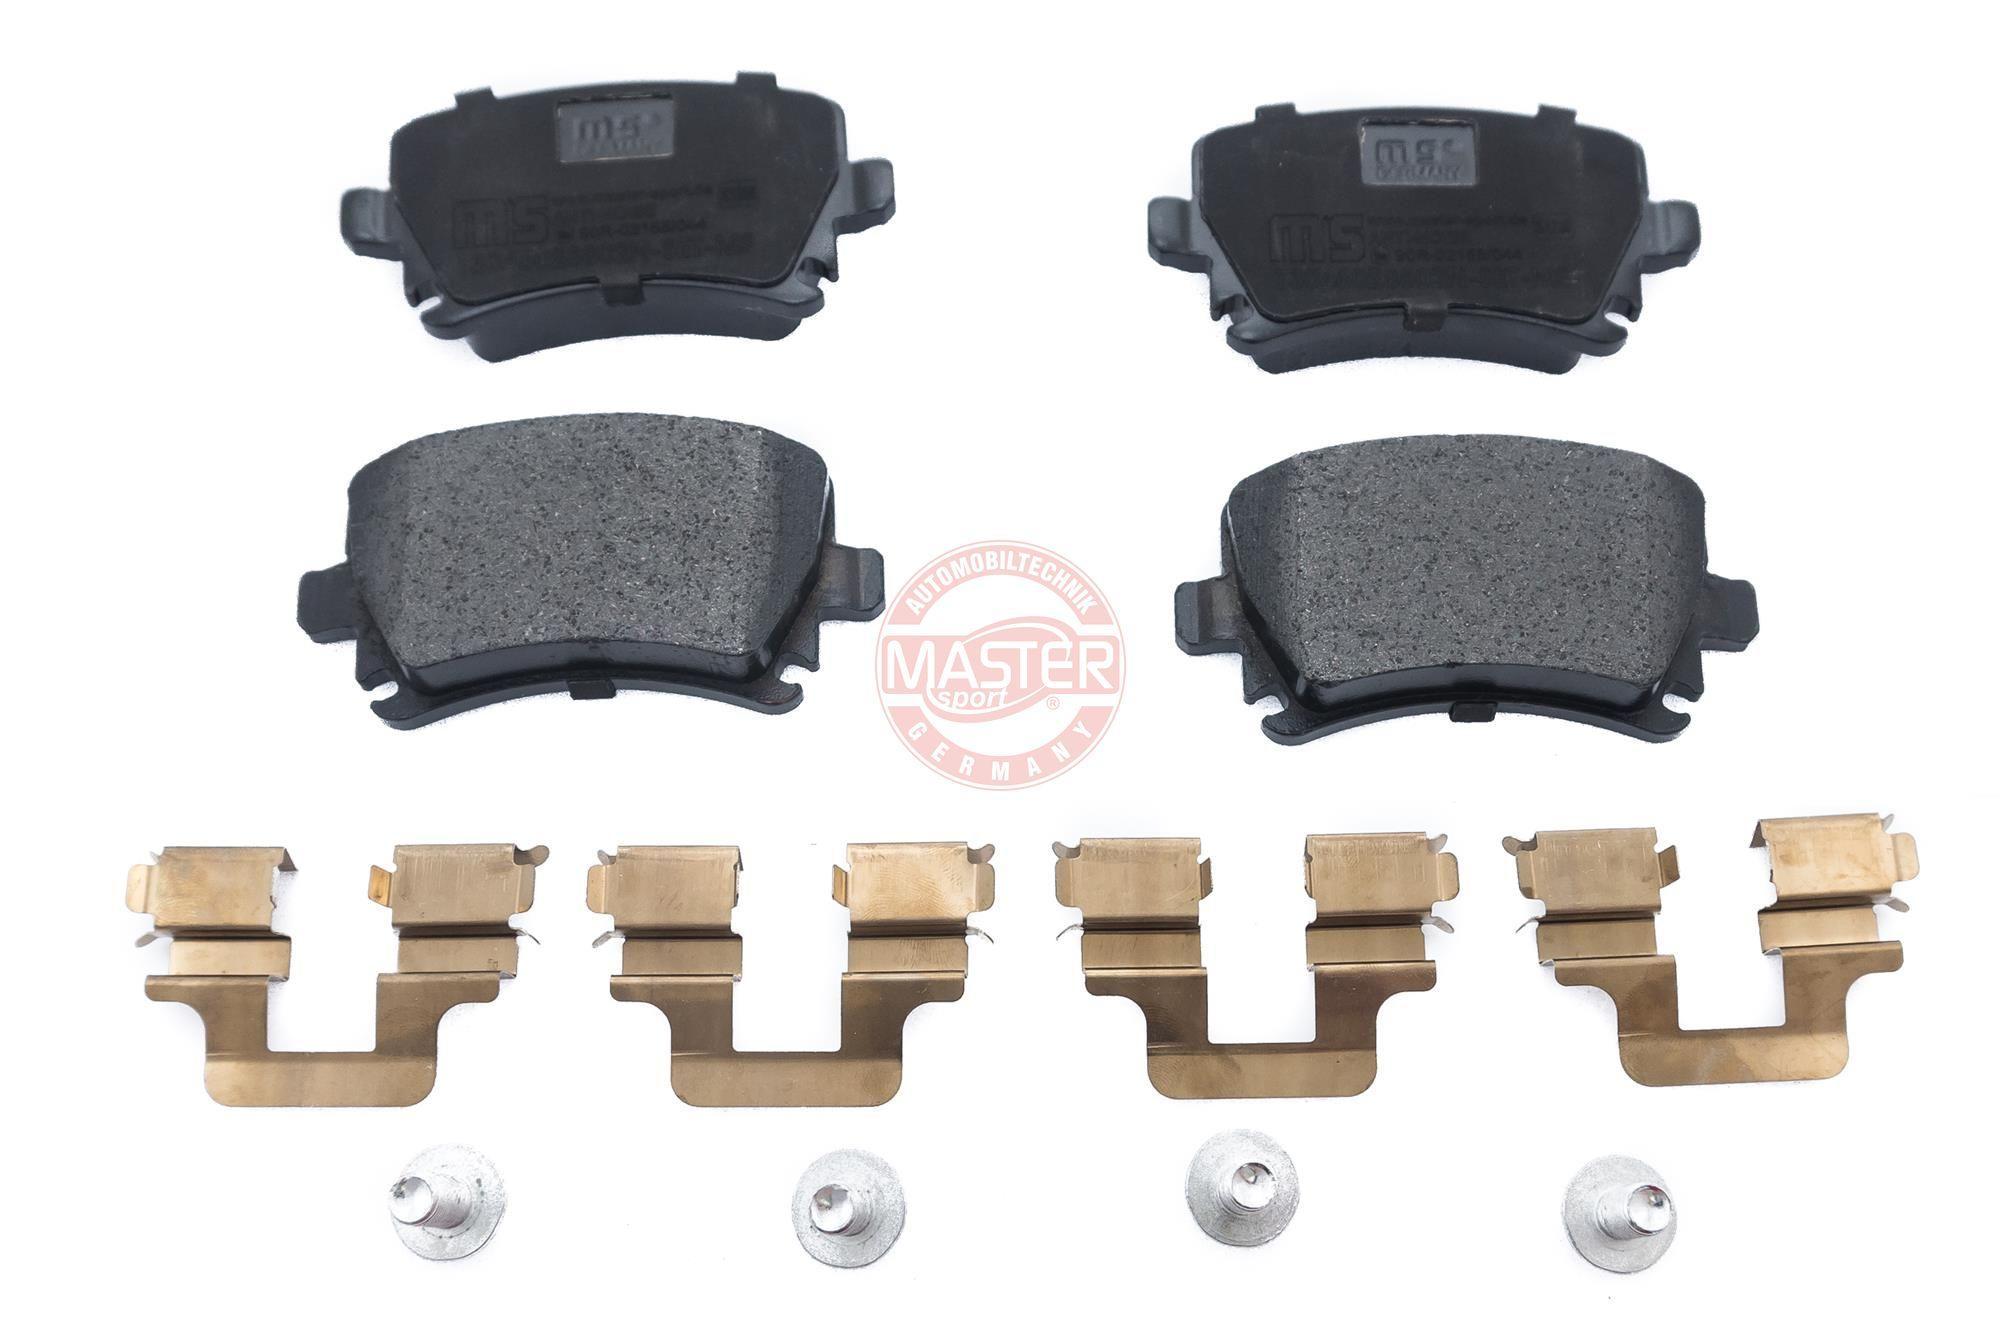 Bremsbeläge 13046028802N-SET-MS MASTER-SPORT 23914 in Original Qualität